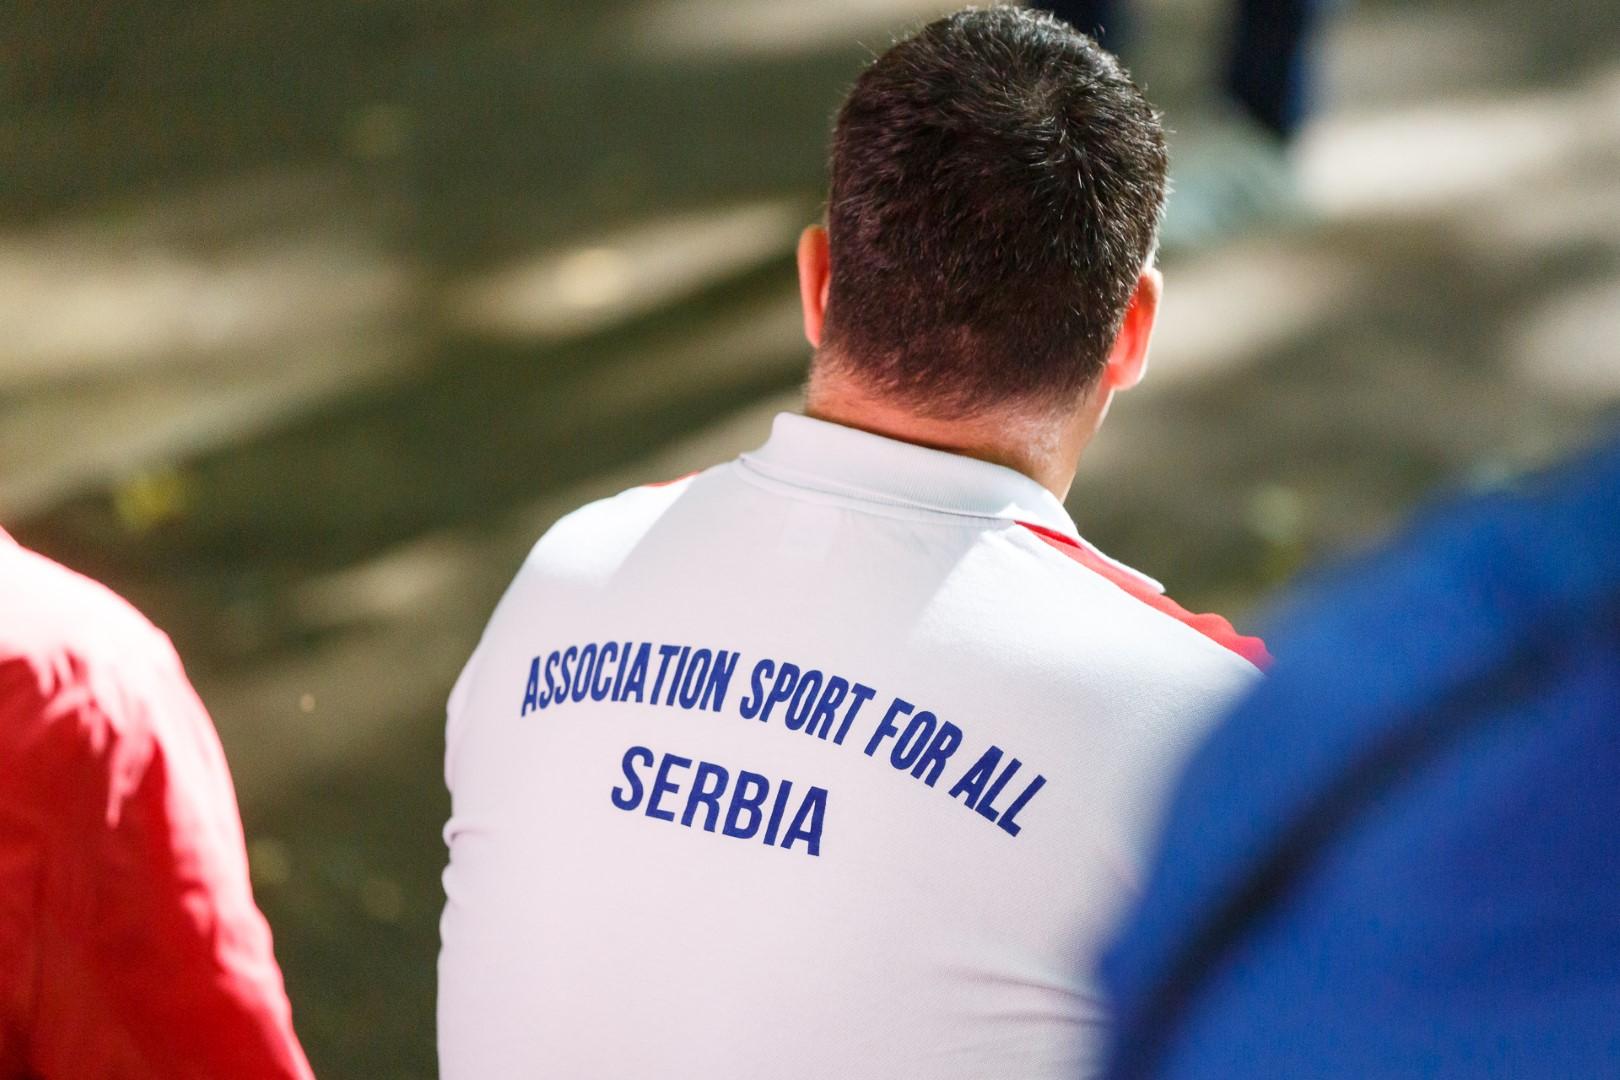 SSZSV_Letenka-_161